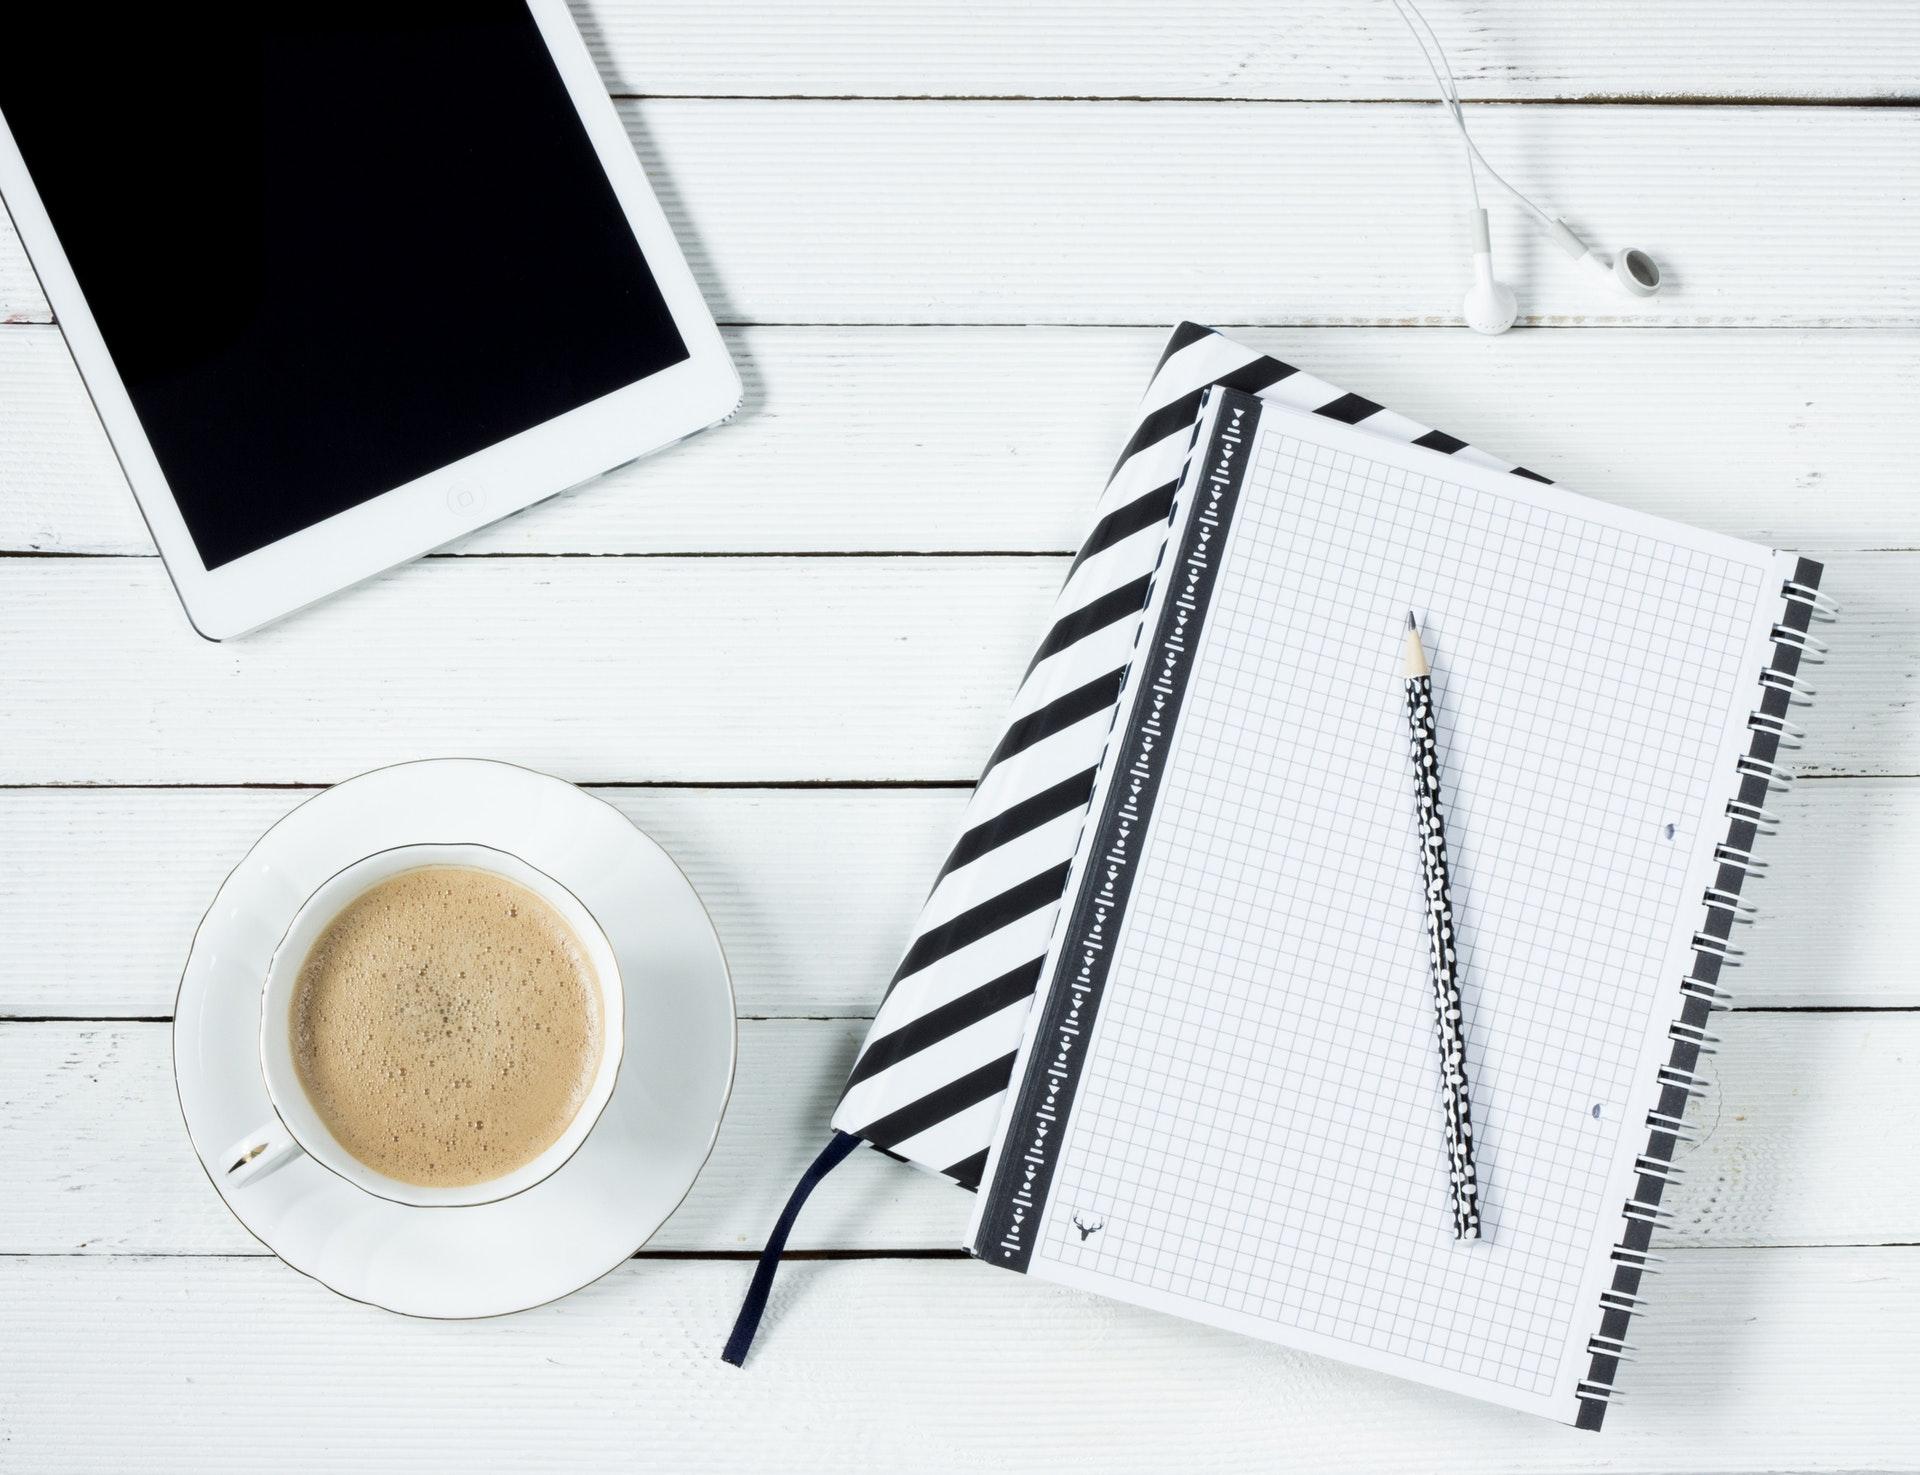 Definir orçamento/planner